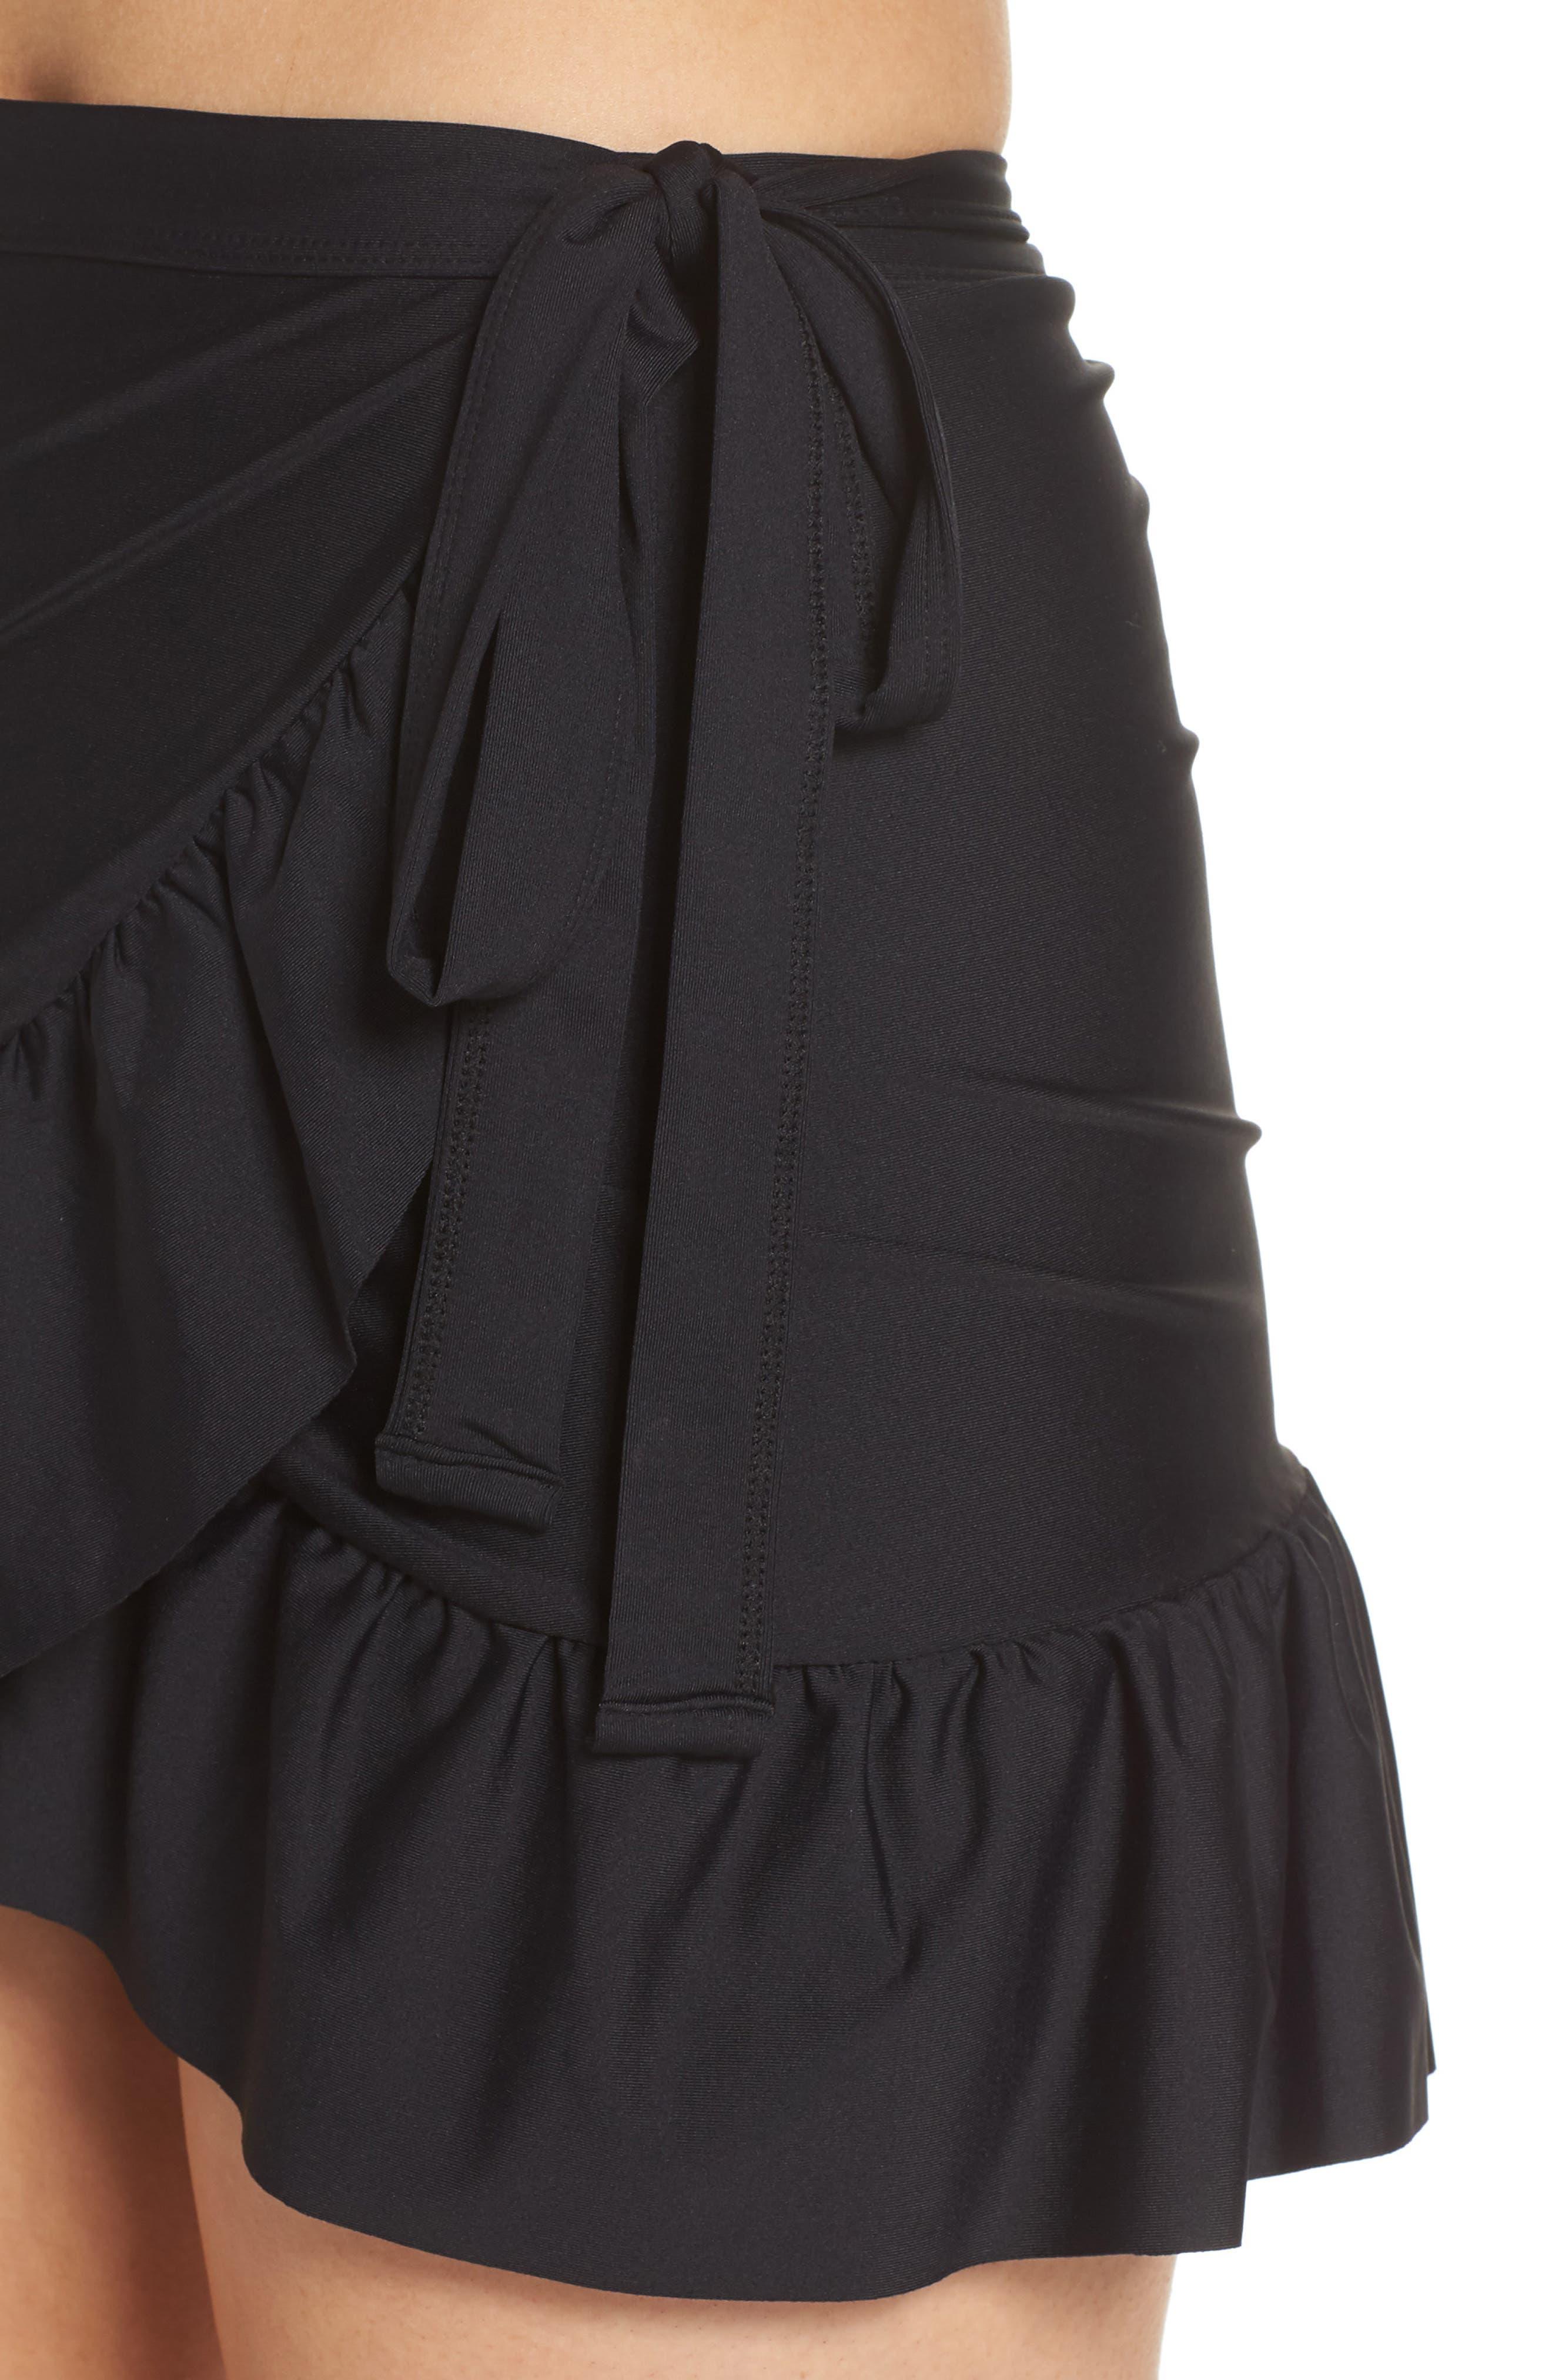 J.CREW,                             Cover-Up Wrap Skirt,                             Alternate thumbnail 4, color,                             001